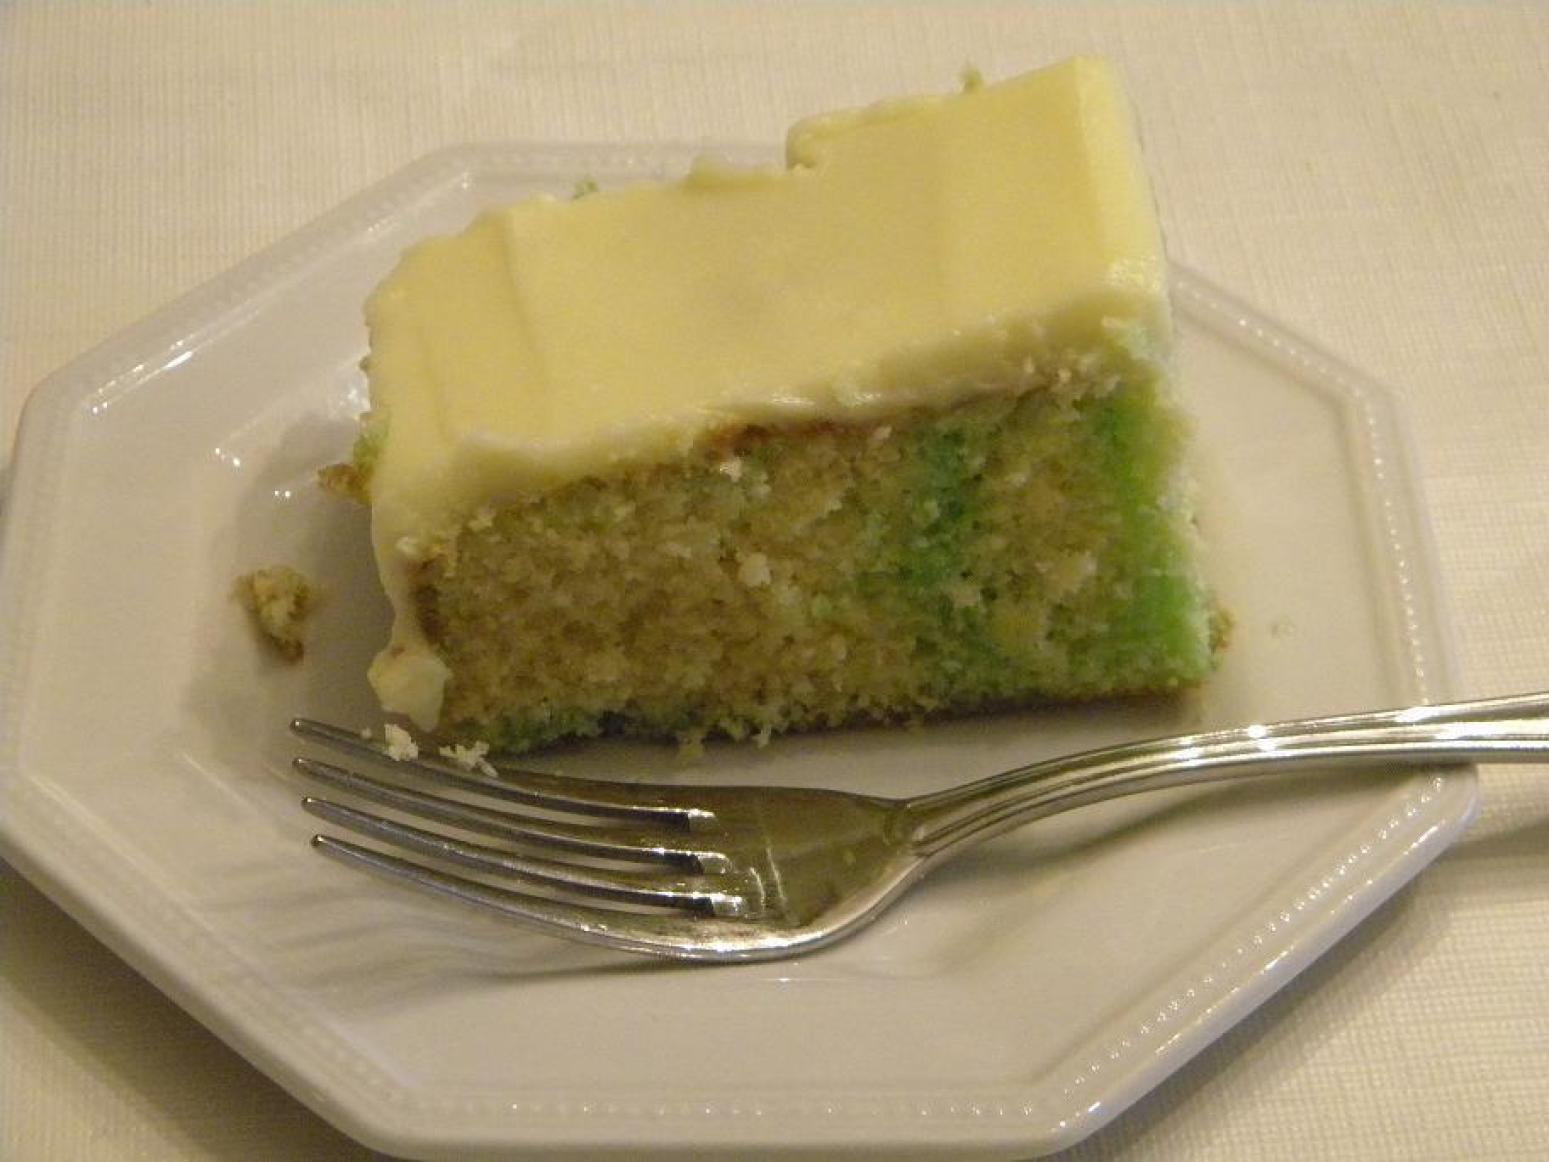 Lemon Lime Refrigerator Cake Recipe